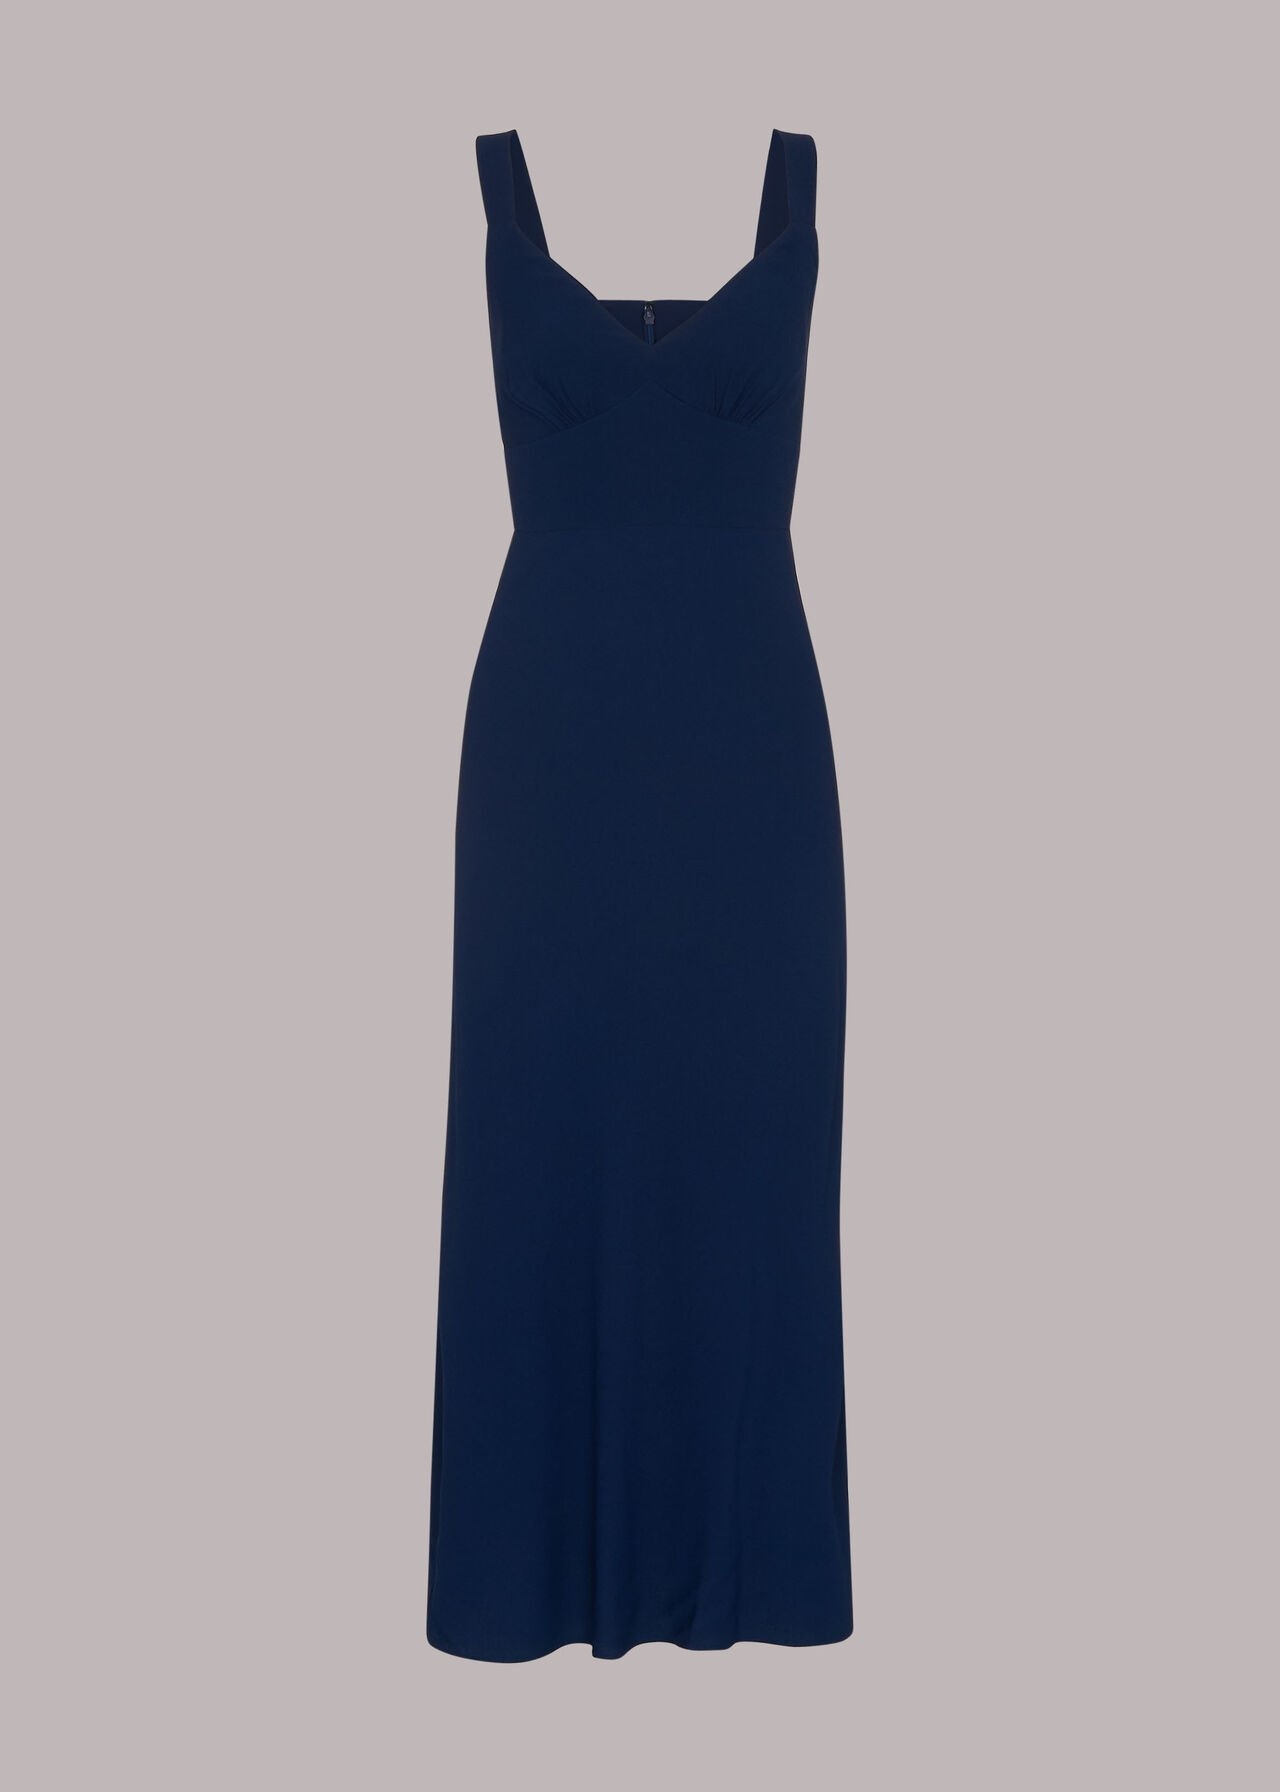 Rachael Sleeveless Dress Navy